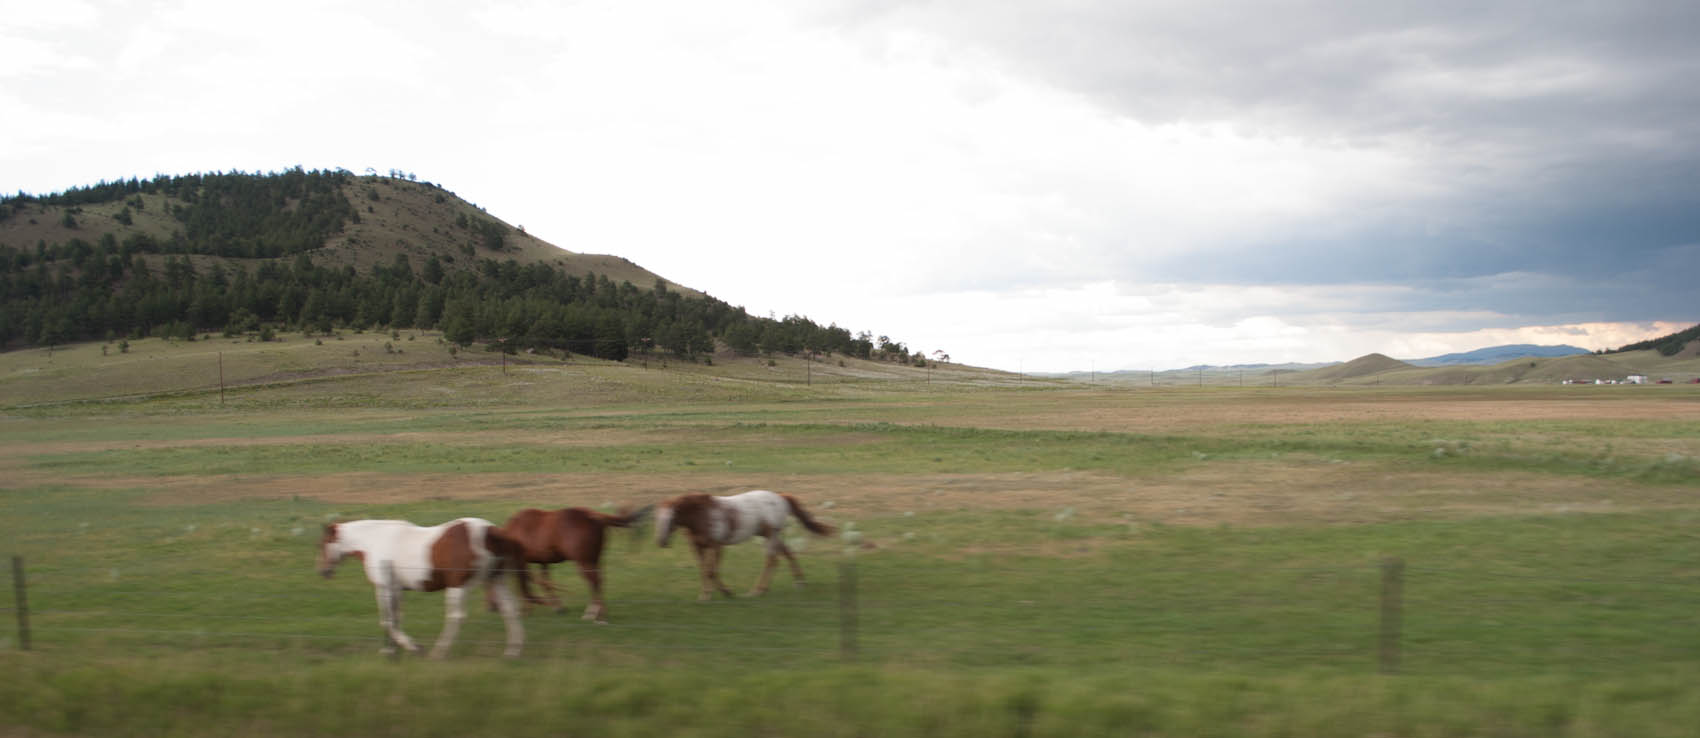 Fairplay, Colorado